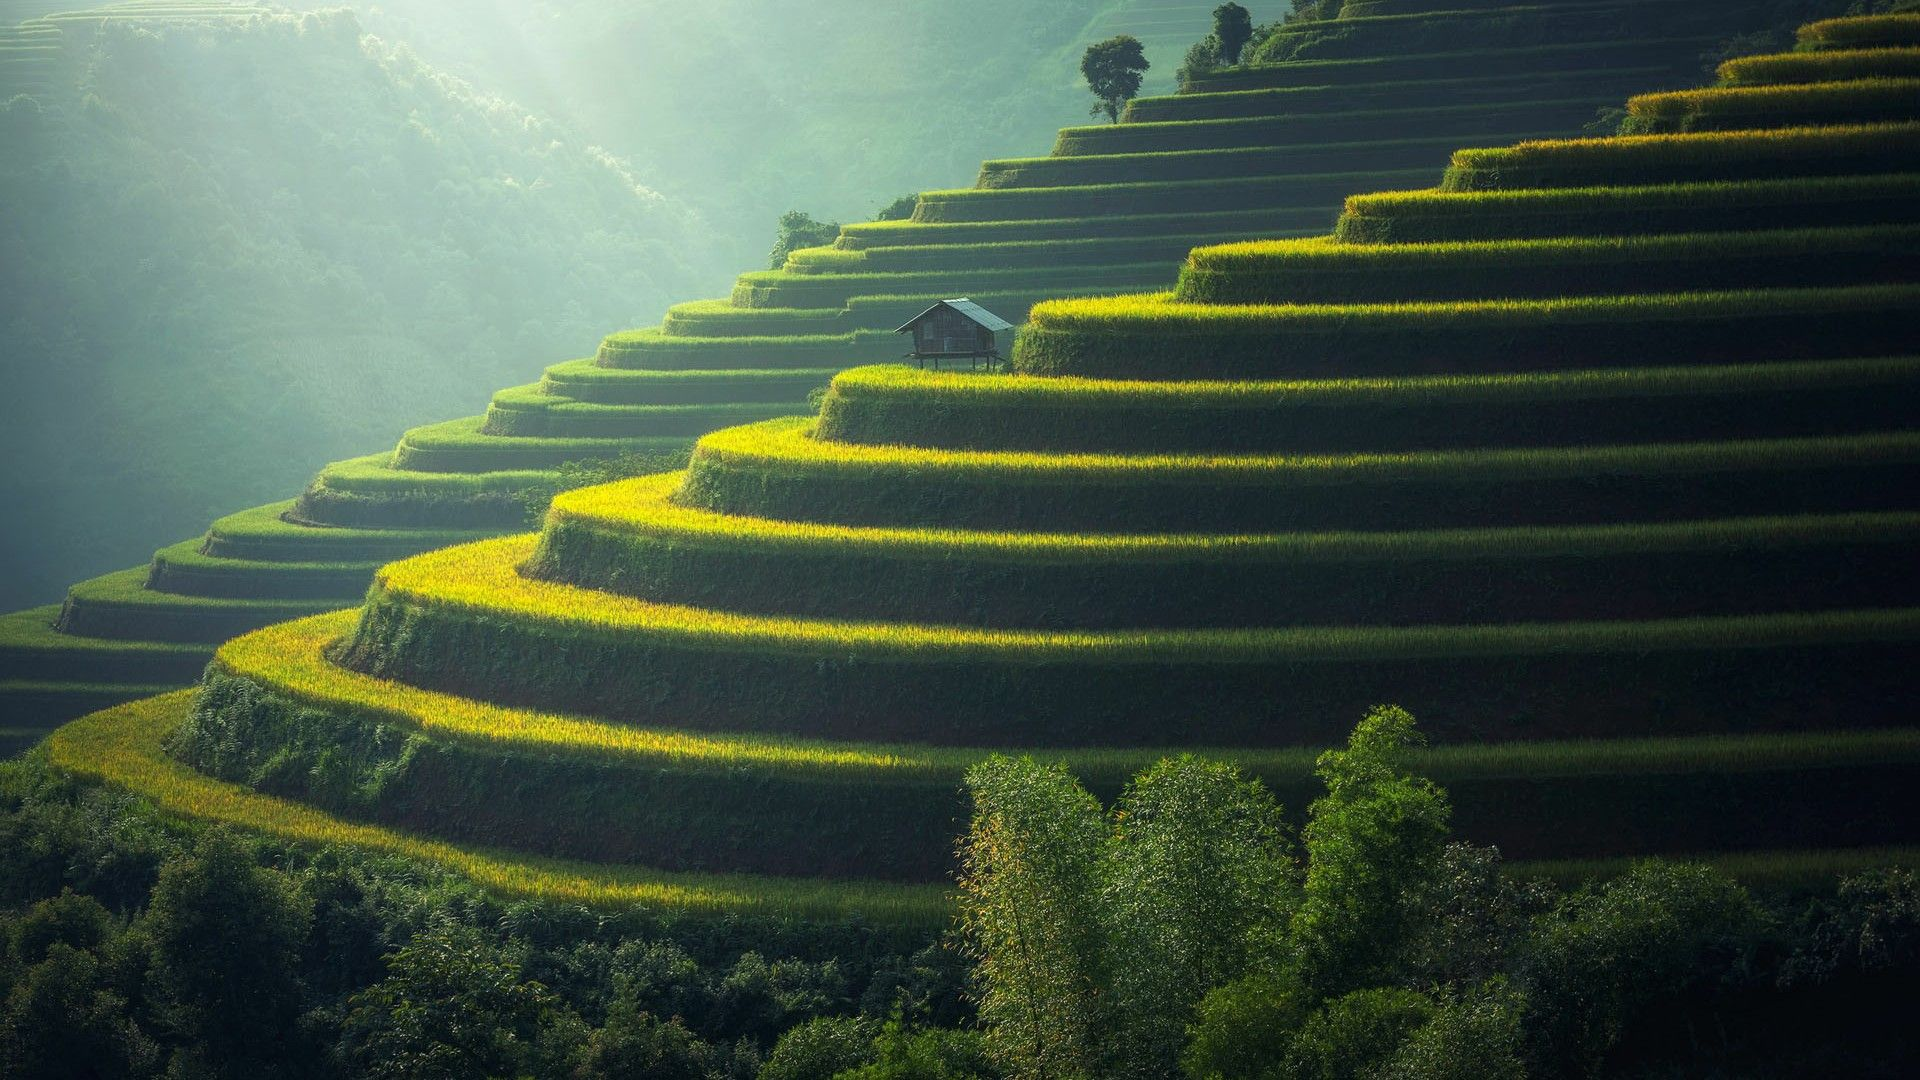 Bali Desktop Wallpapers Top Free Bali Desktop Backgrounds